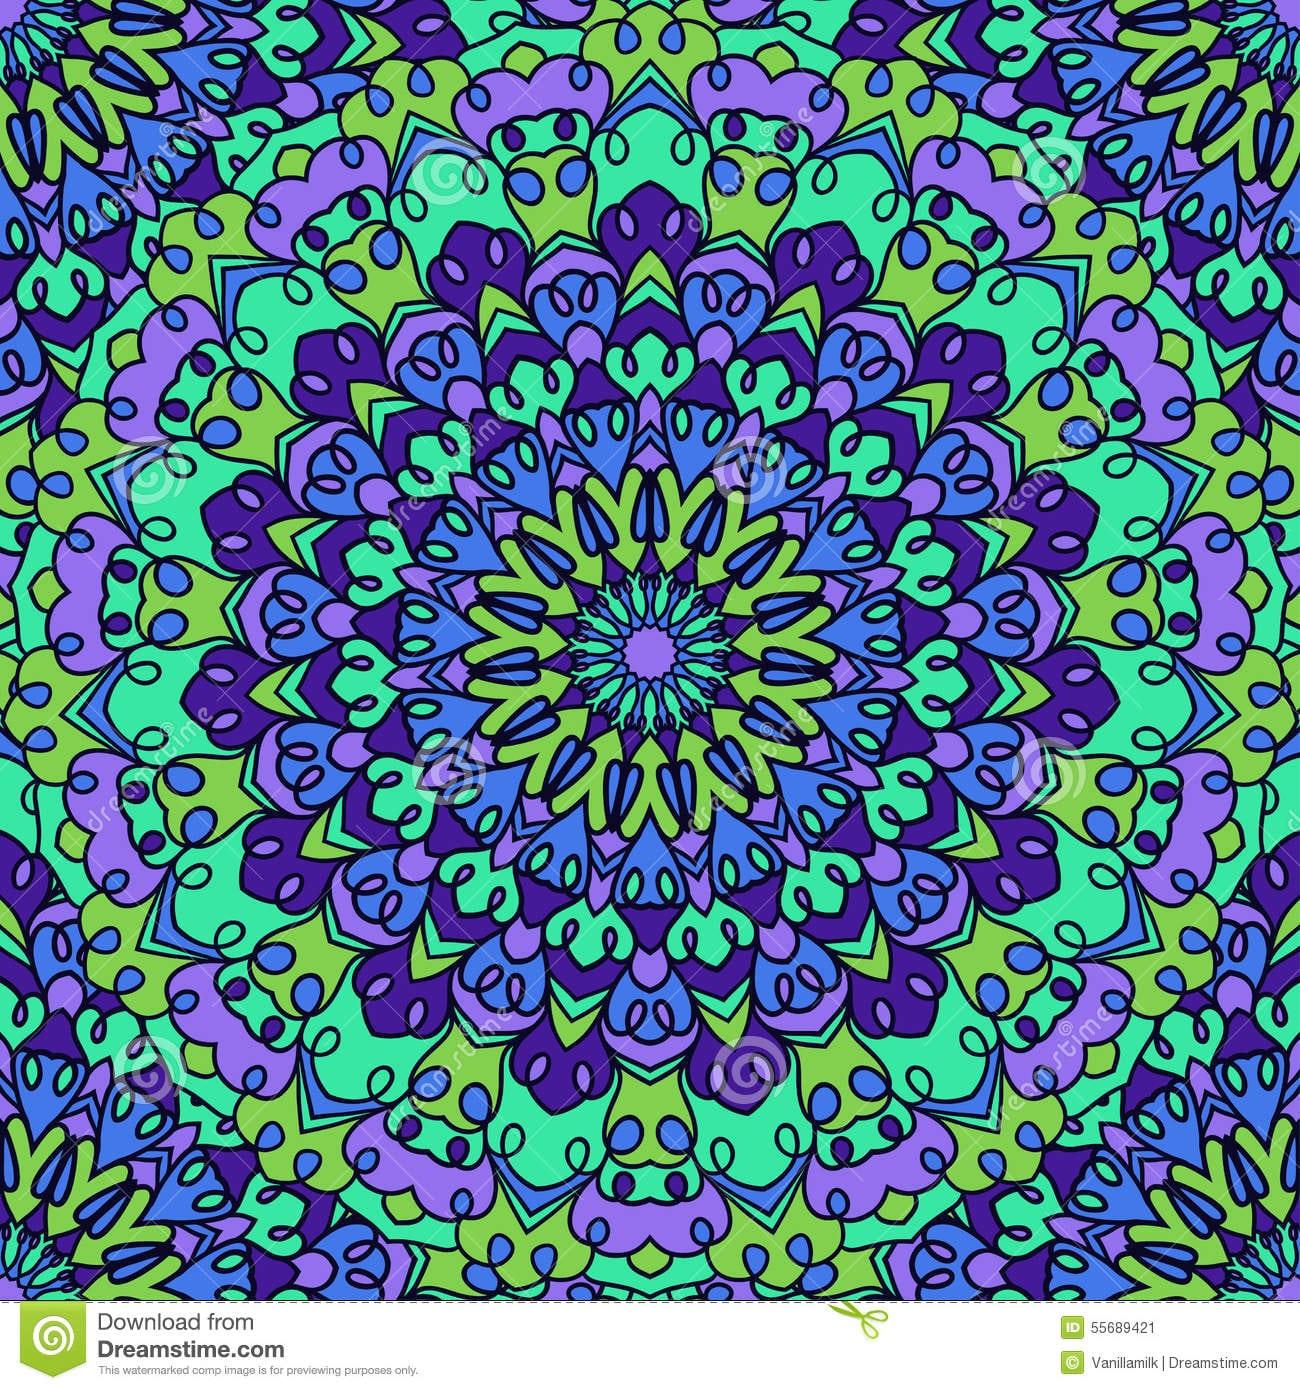 Fundo Sem Emenda Abstrato Decorativo Colorido Brilhante Glaring Do